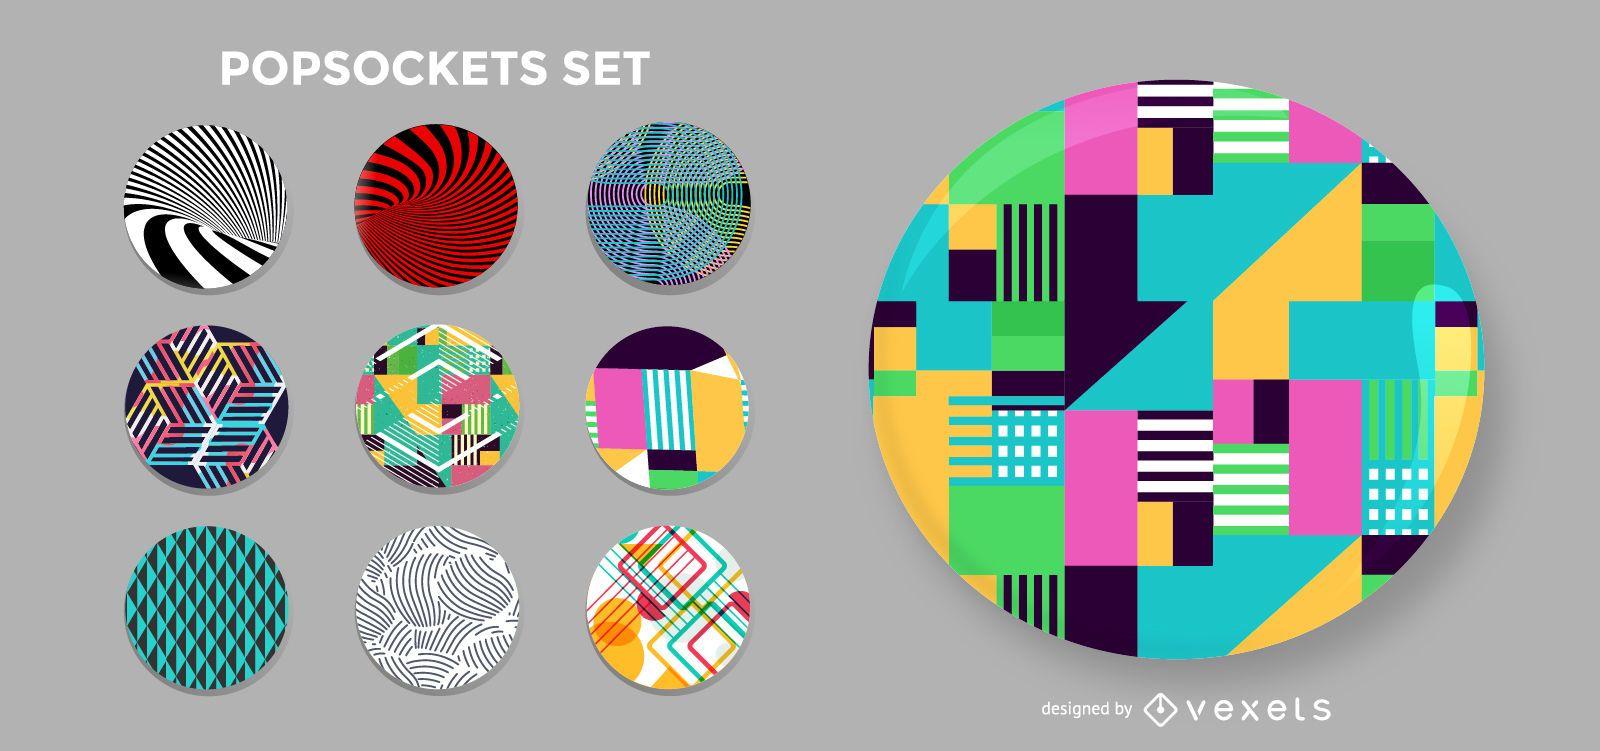 Set popsockets de formas geométricas